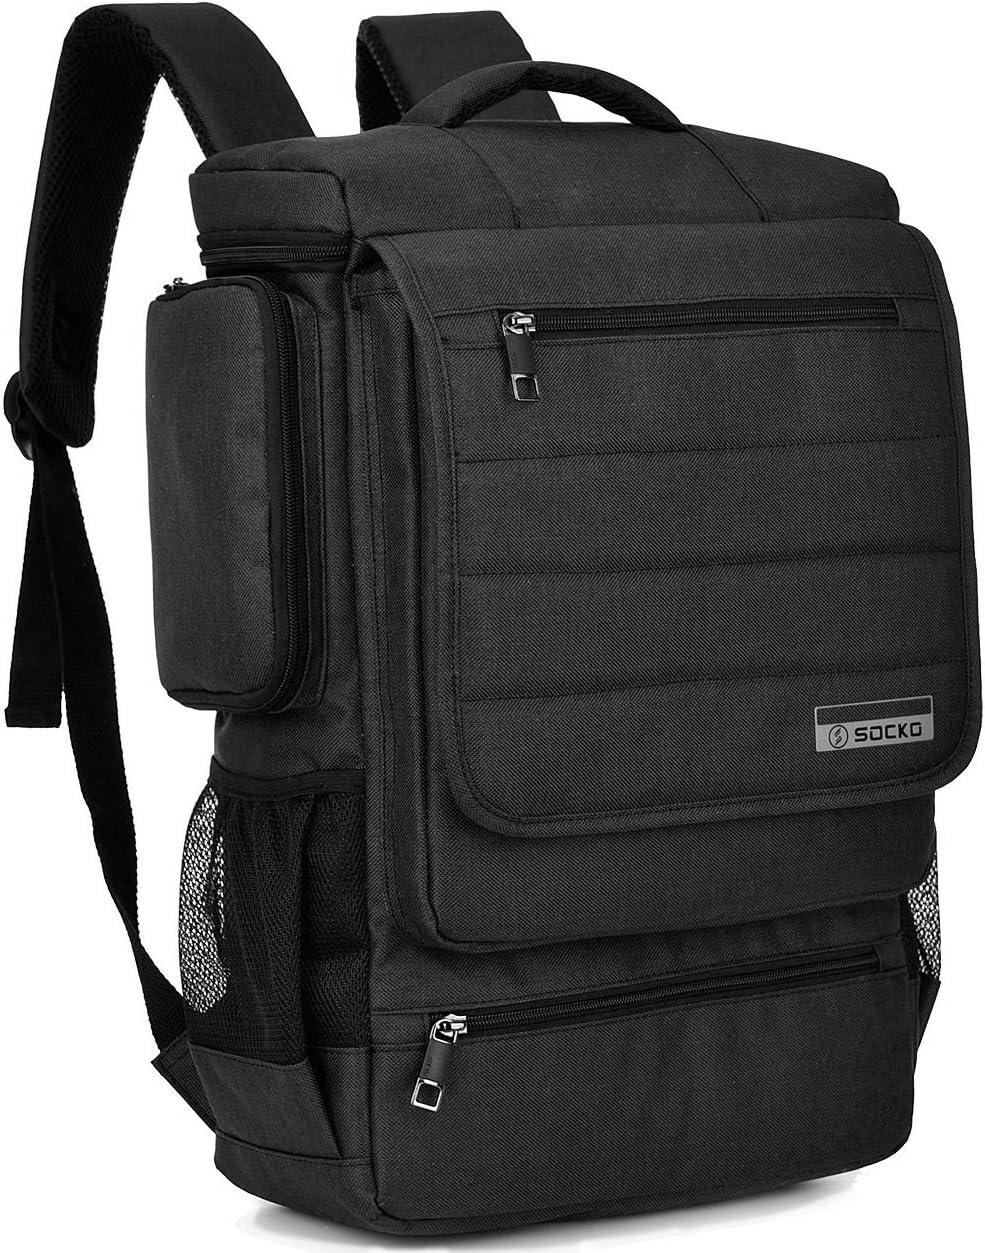 SOCKO Multi-Functional Laptop Backpack Business Travel Luggage Bag College Backpack Shoulder Bag for Men Women Casual Daypack Computer Rucksack Fits Up to 17.3 Inch Laptop/Notebook, Black